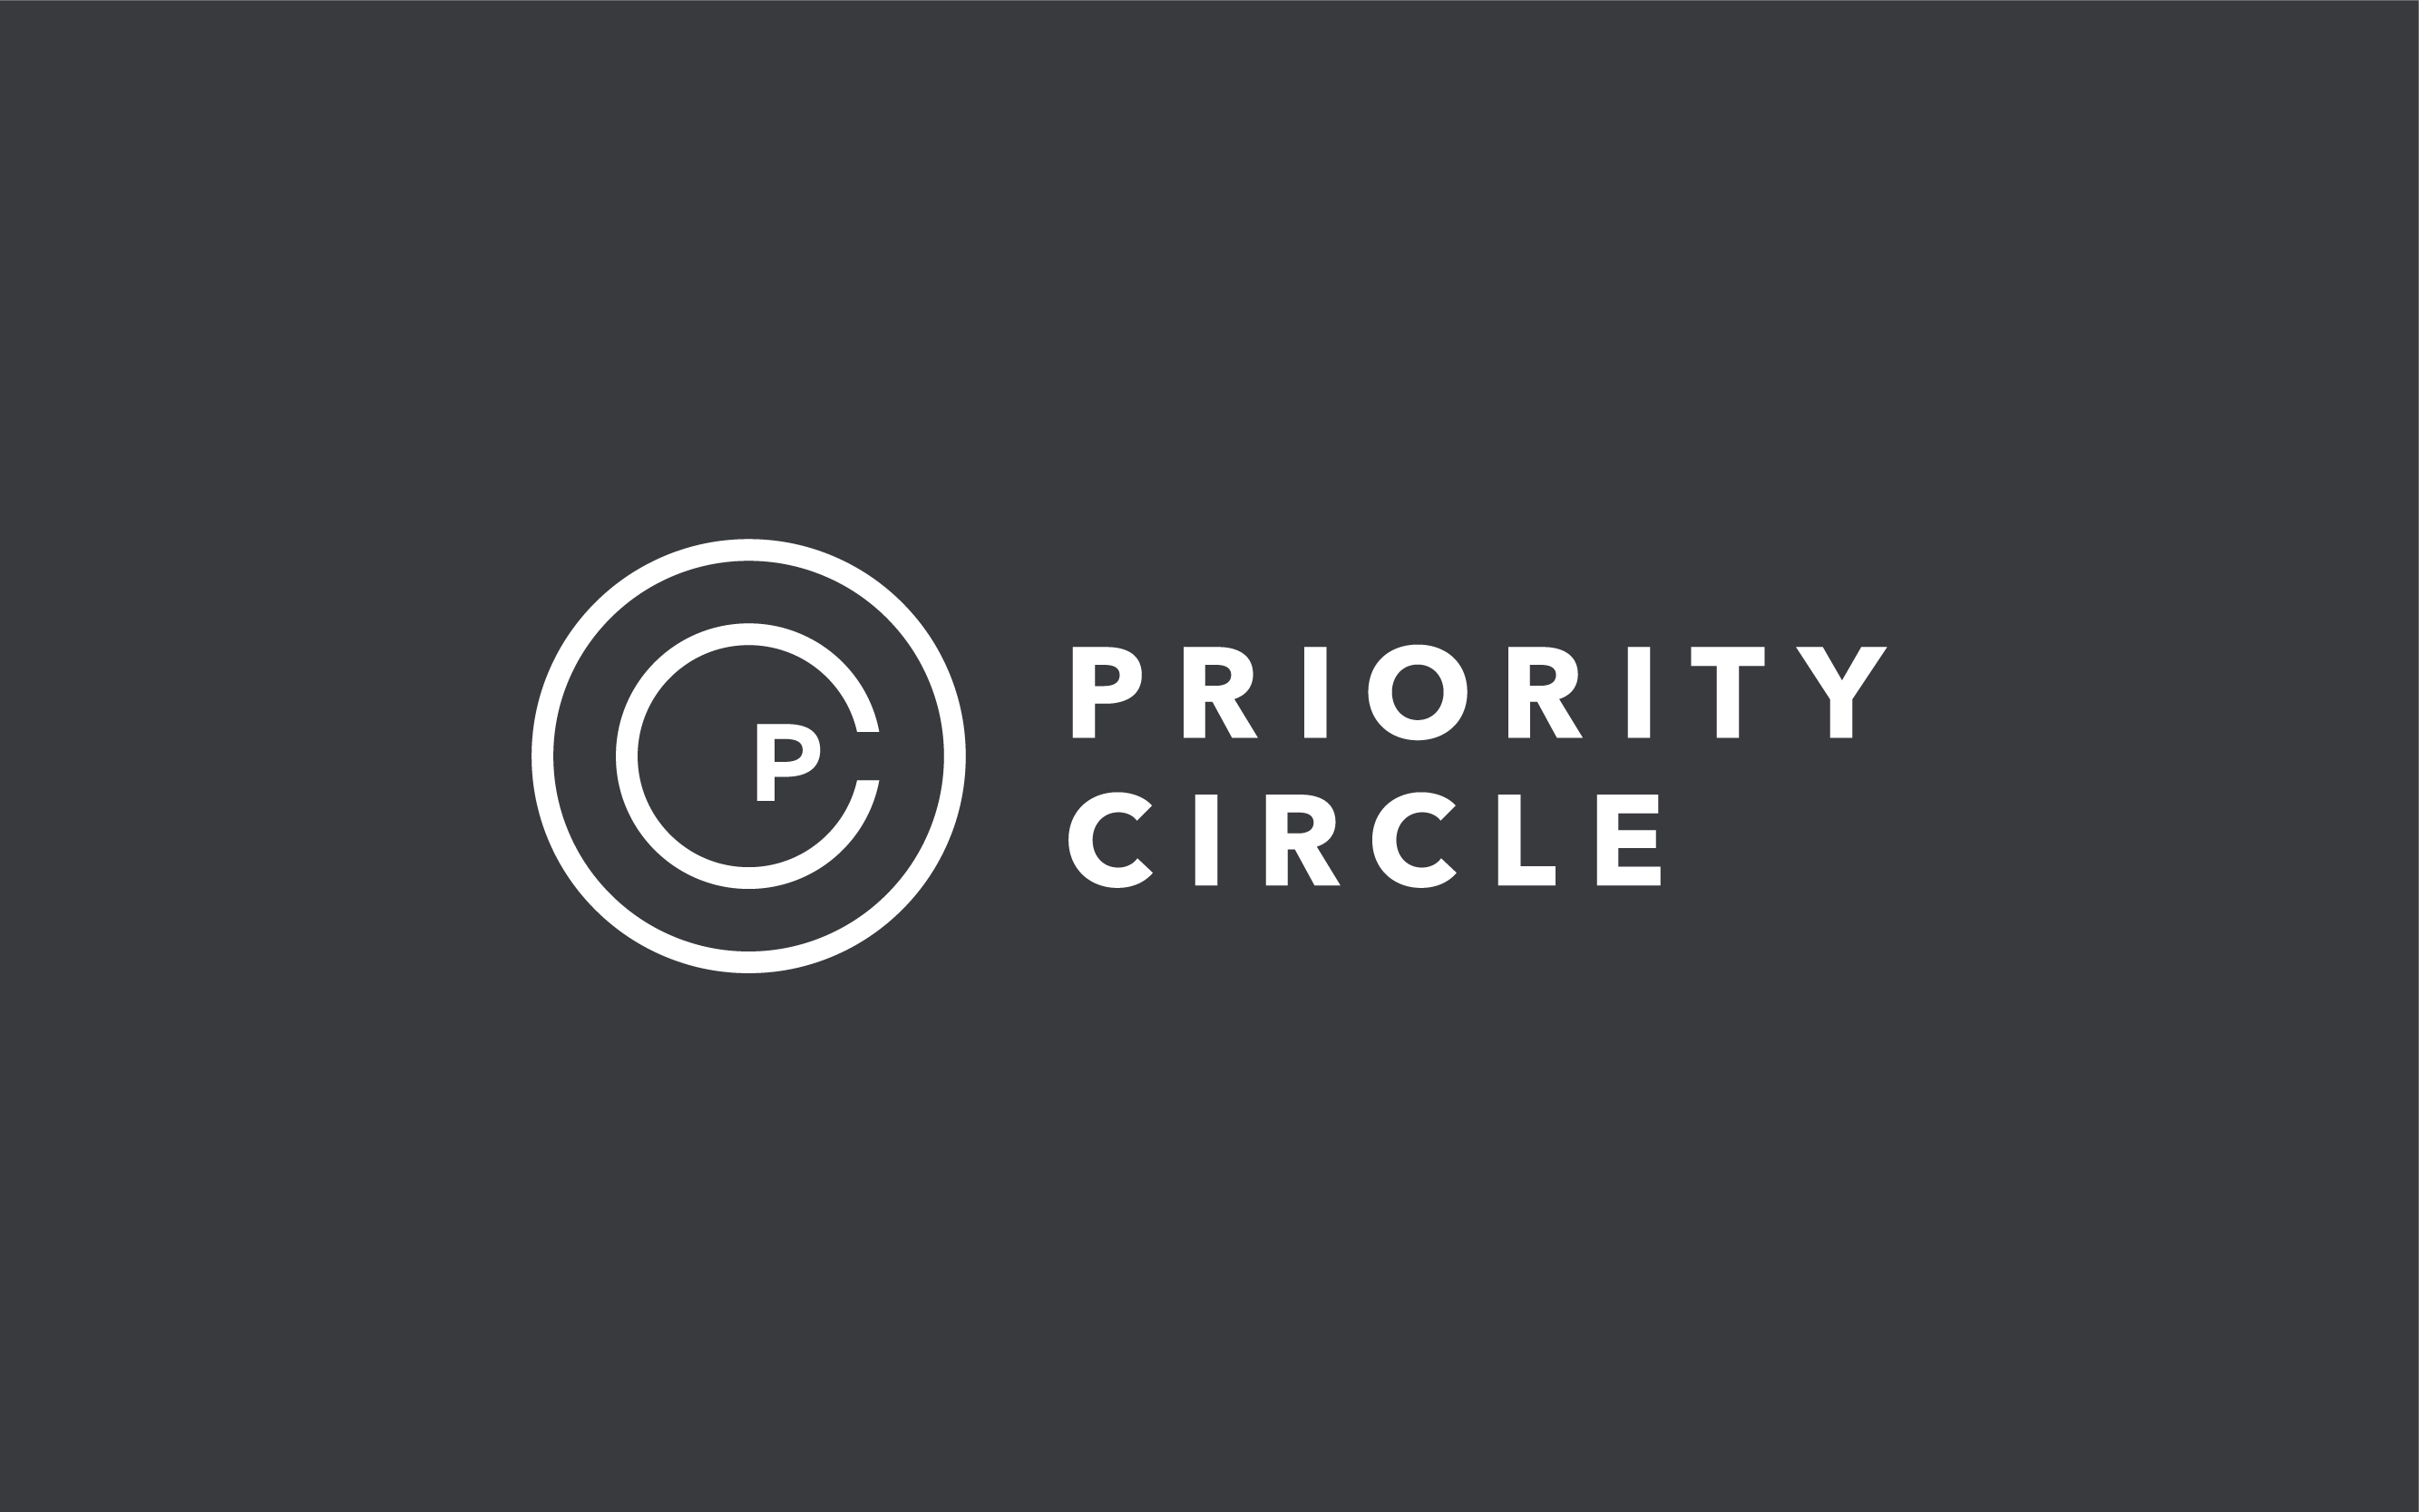 qb_priority_circle-07